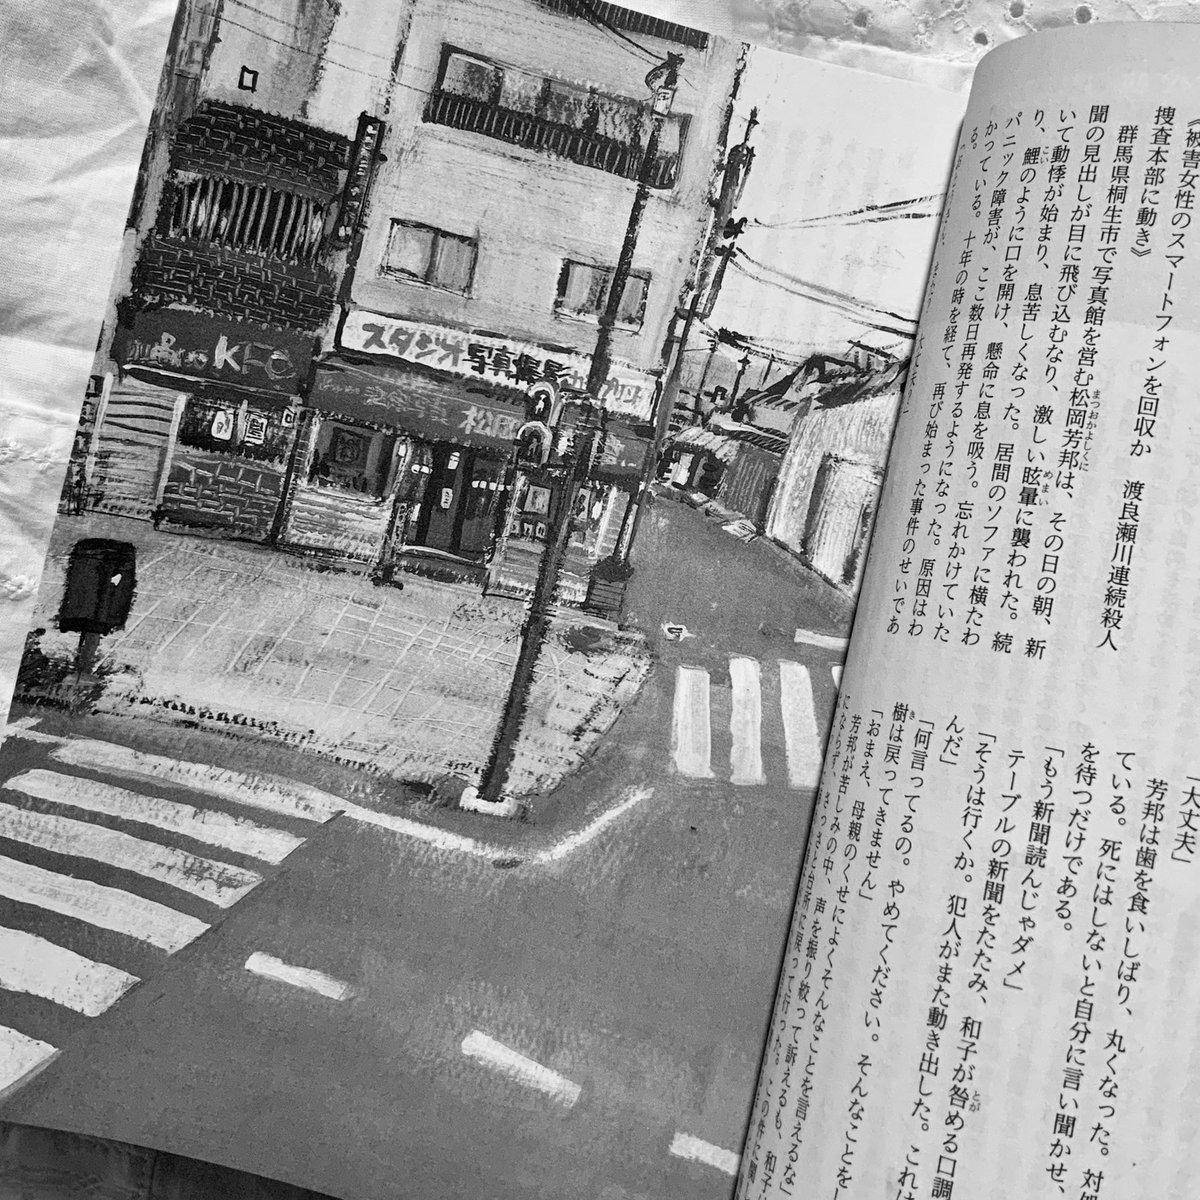 test ツイッターメディア - 小説すばる8月号、奥田英朗「リバー」第2回、扉絵と挿絵を描いています。桐生市の古い写真館と、太田市の出稼ぎ外国人労働者向けのスナック、という設定です。#イラストレーター #イラストレーション #奥田英朗 https://t.co/4hLUTW740x